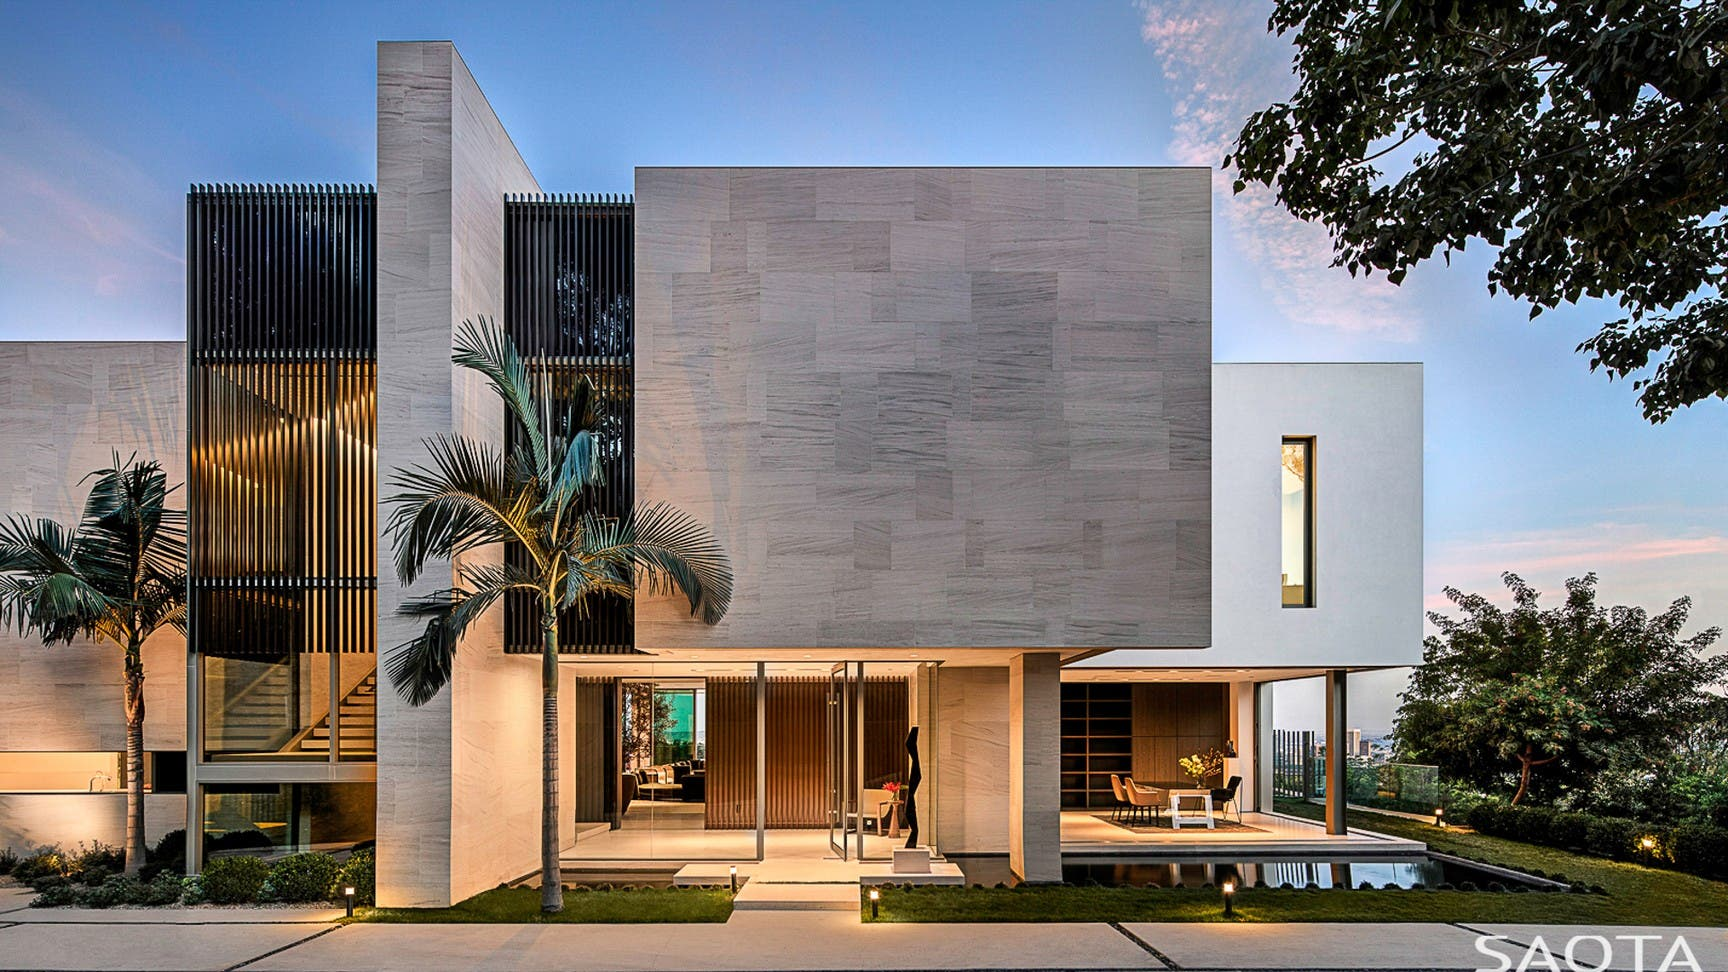 stradella architecture south africa los angeles real estate saota